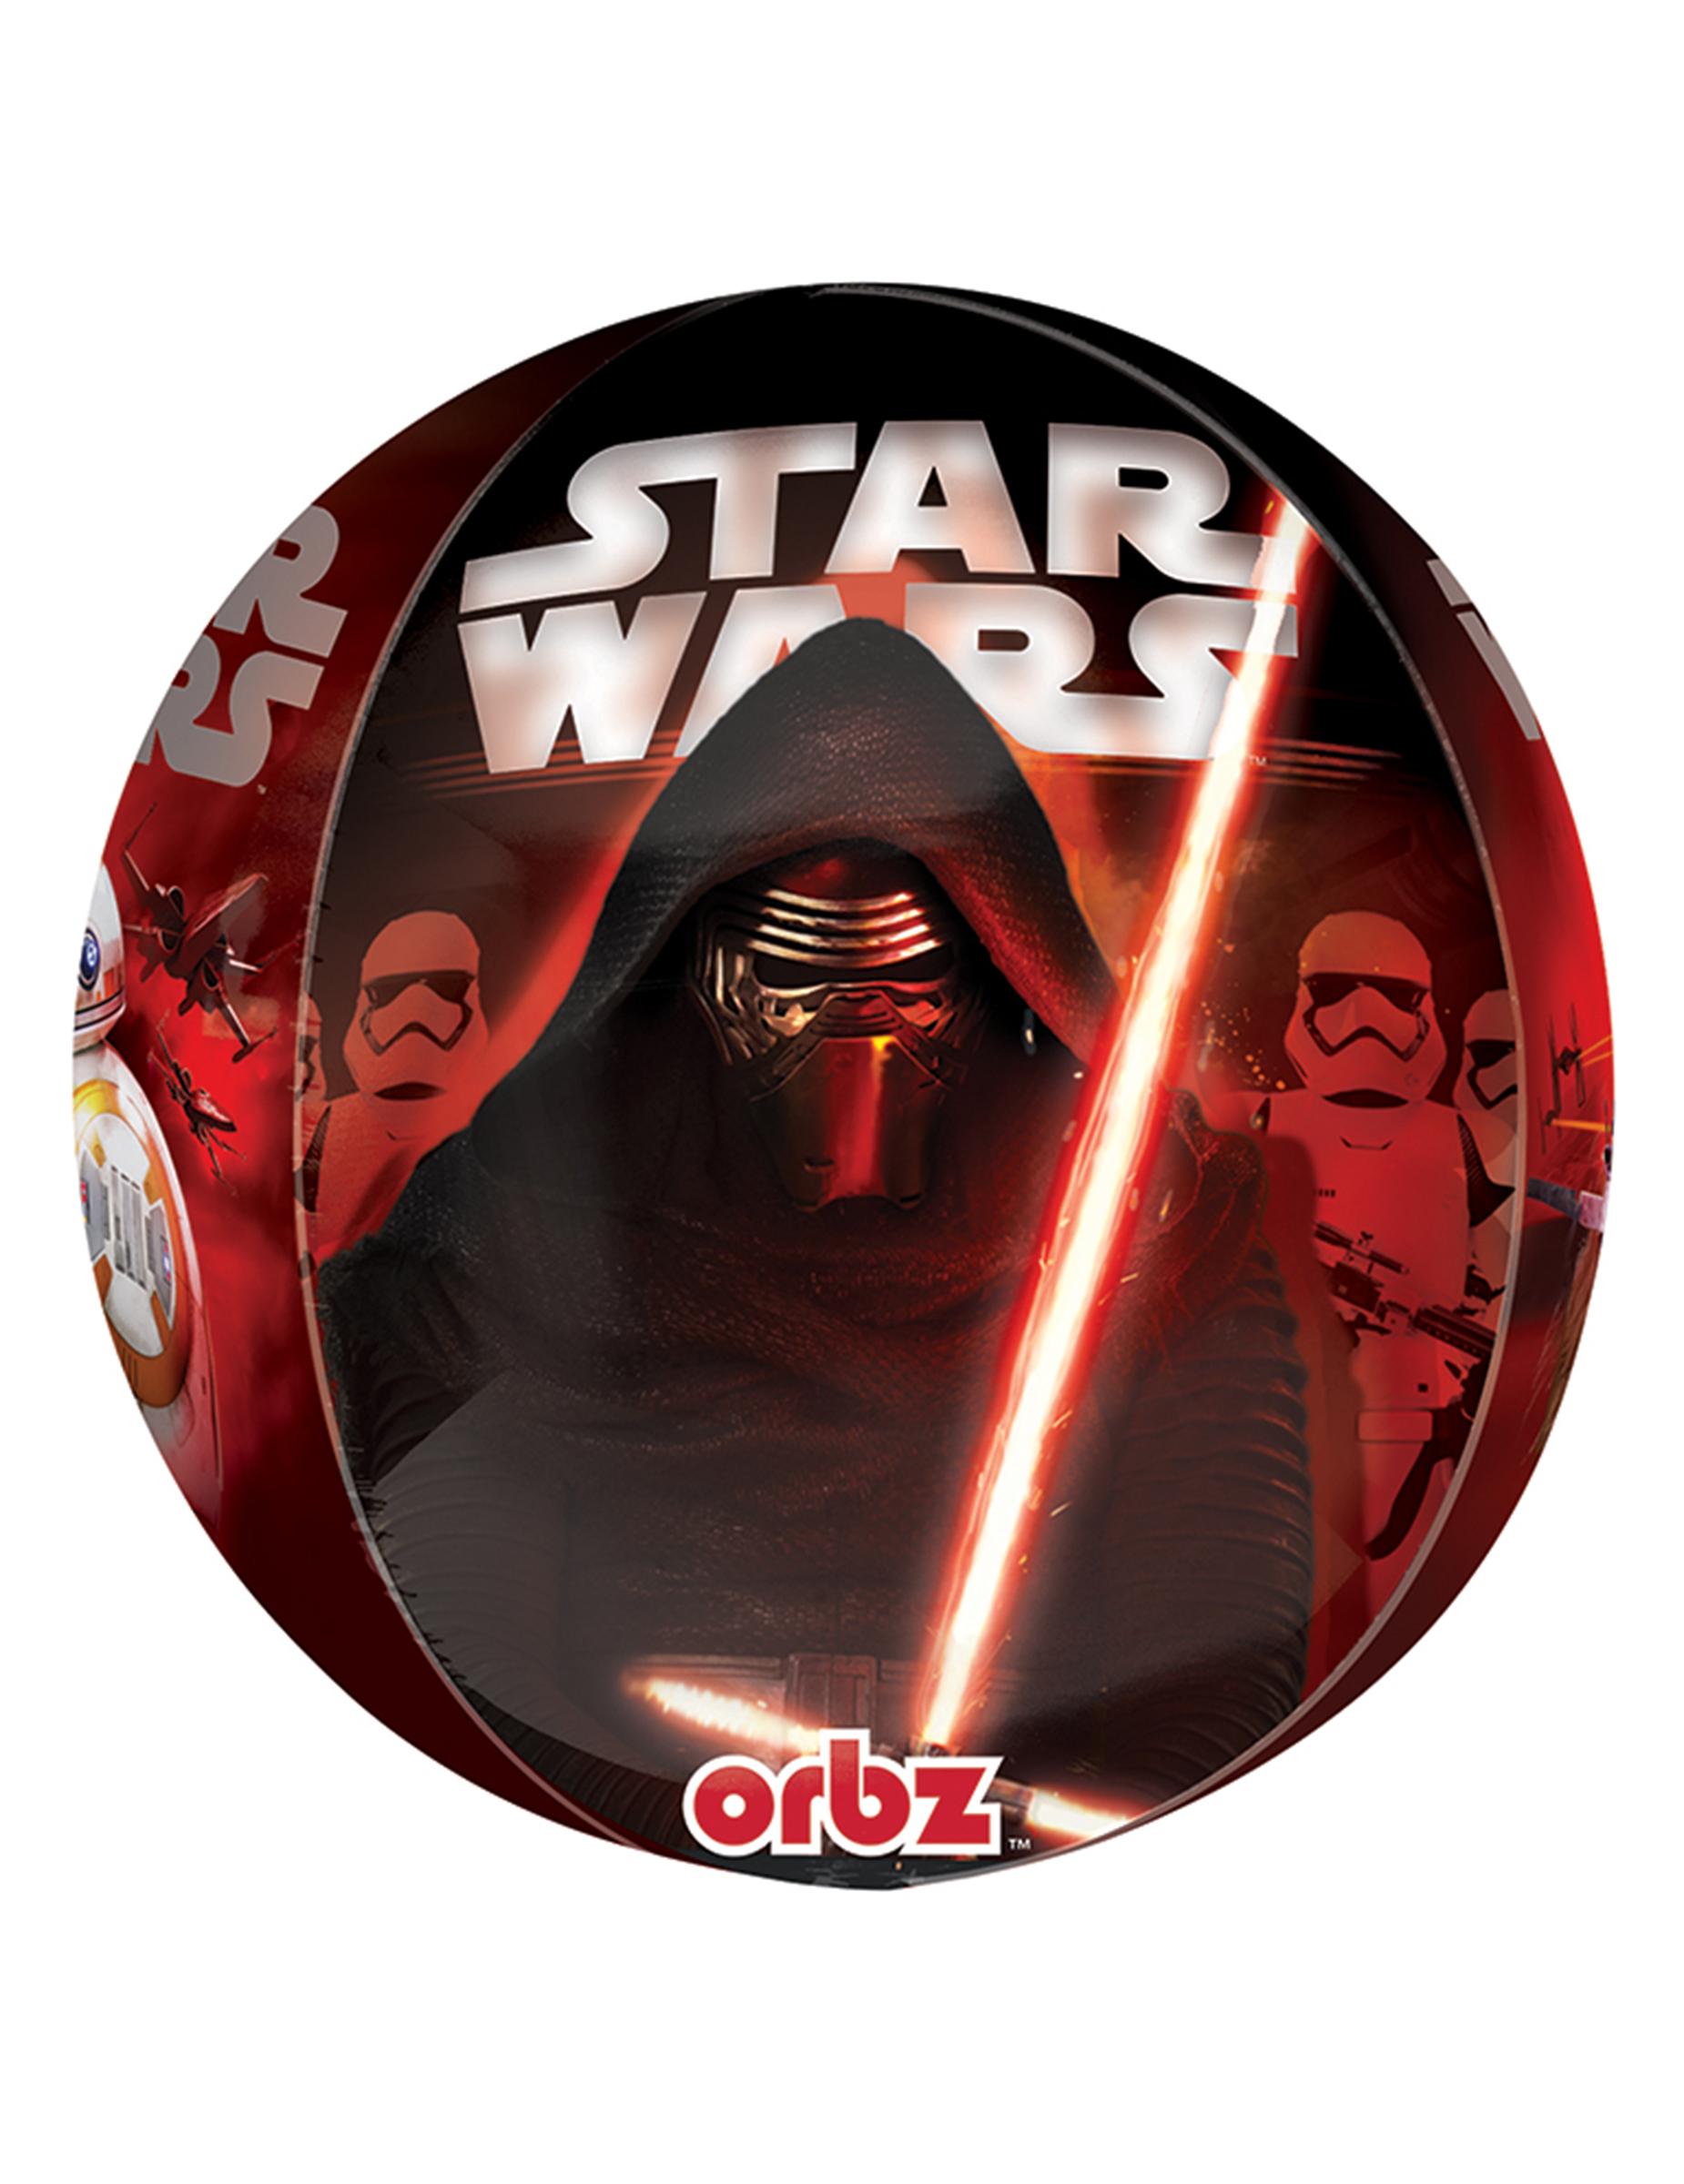 Ballon en aluminium personnages star wars vii 38 x 40 cm - Personnage star wars 7 ...